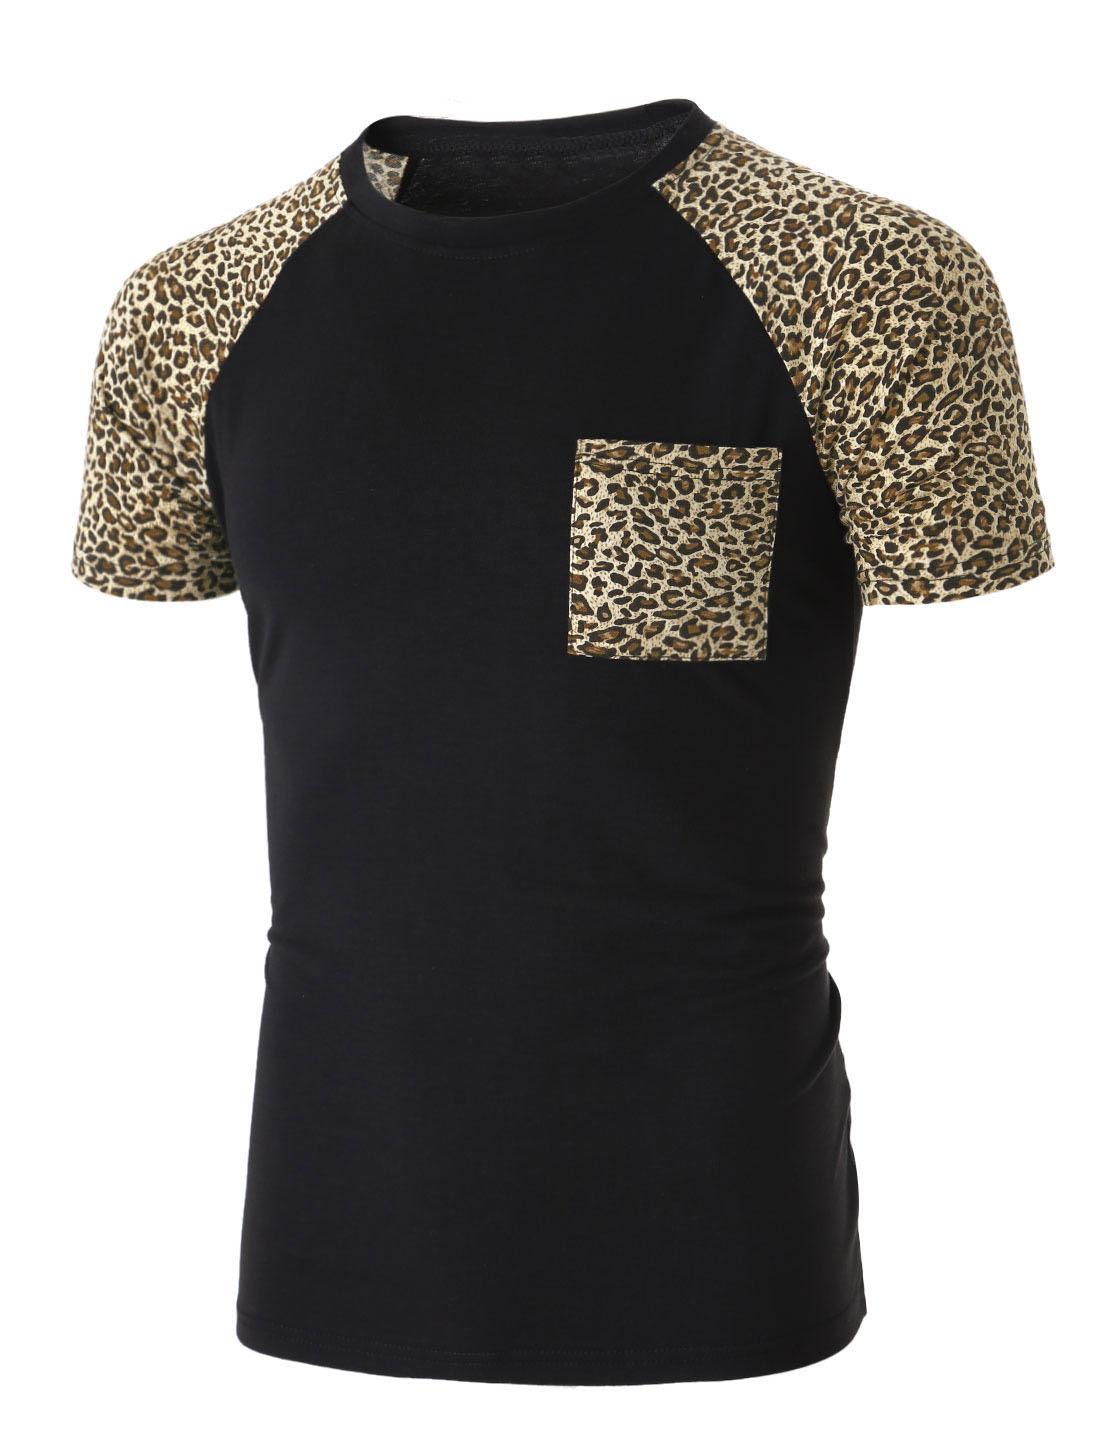 Man Newly Leopard Pattern Short Raglan Sleeve Black Casual Shirt M